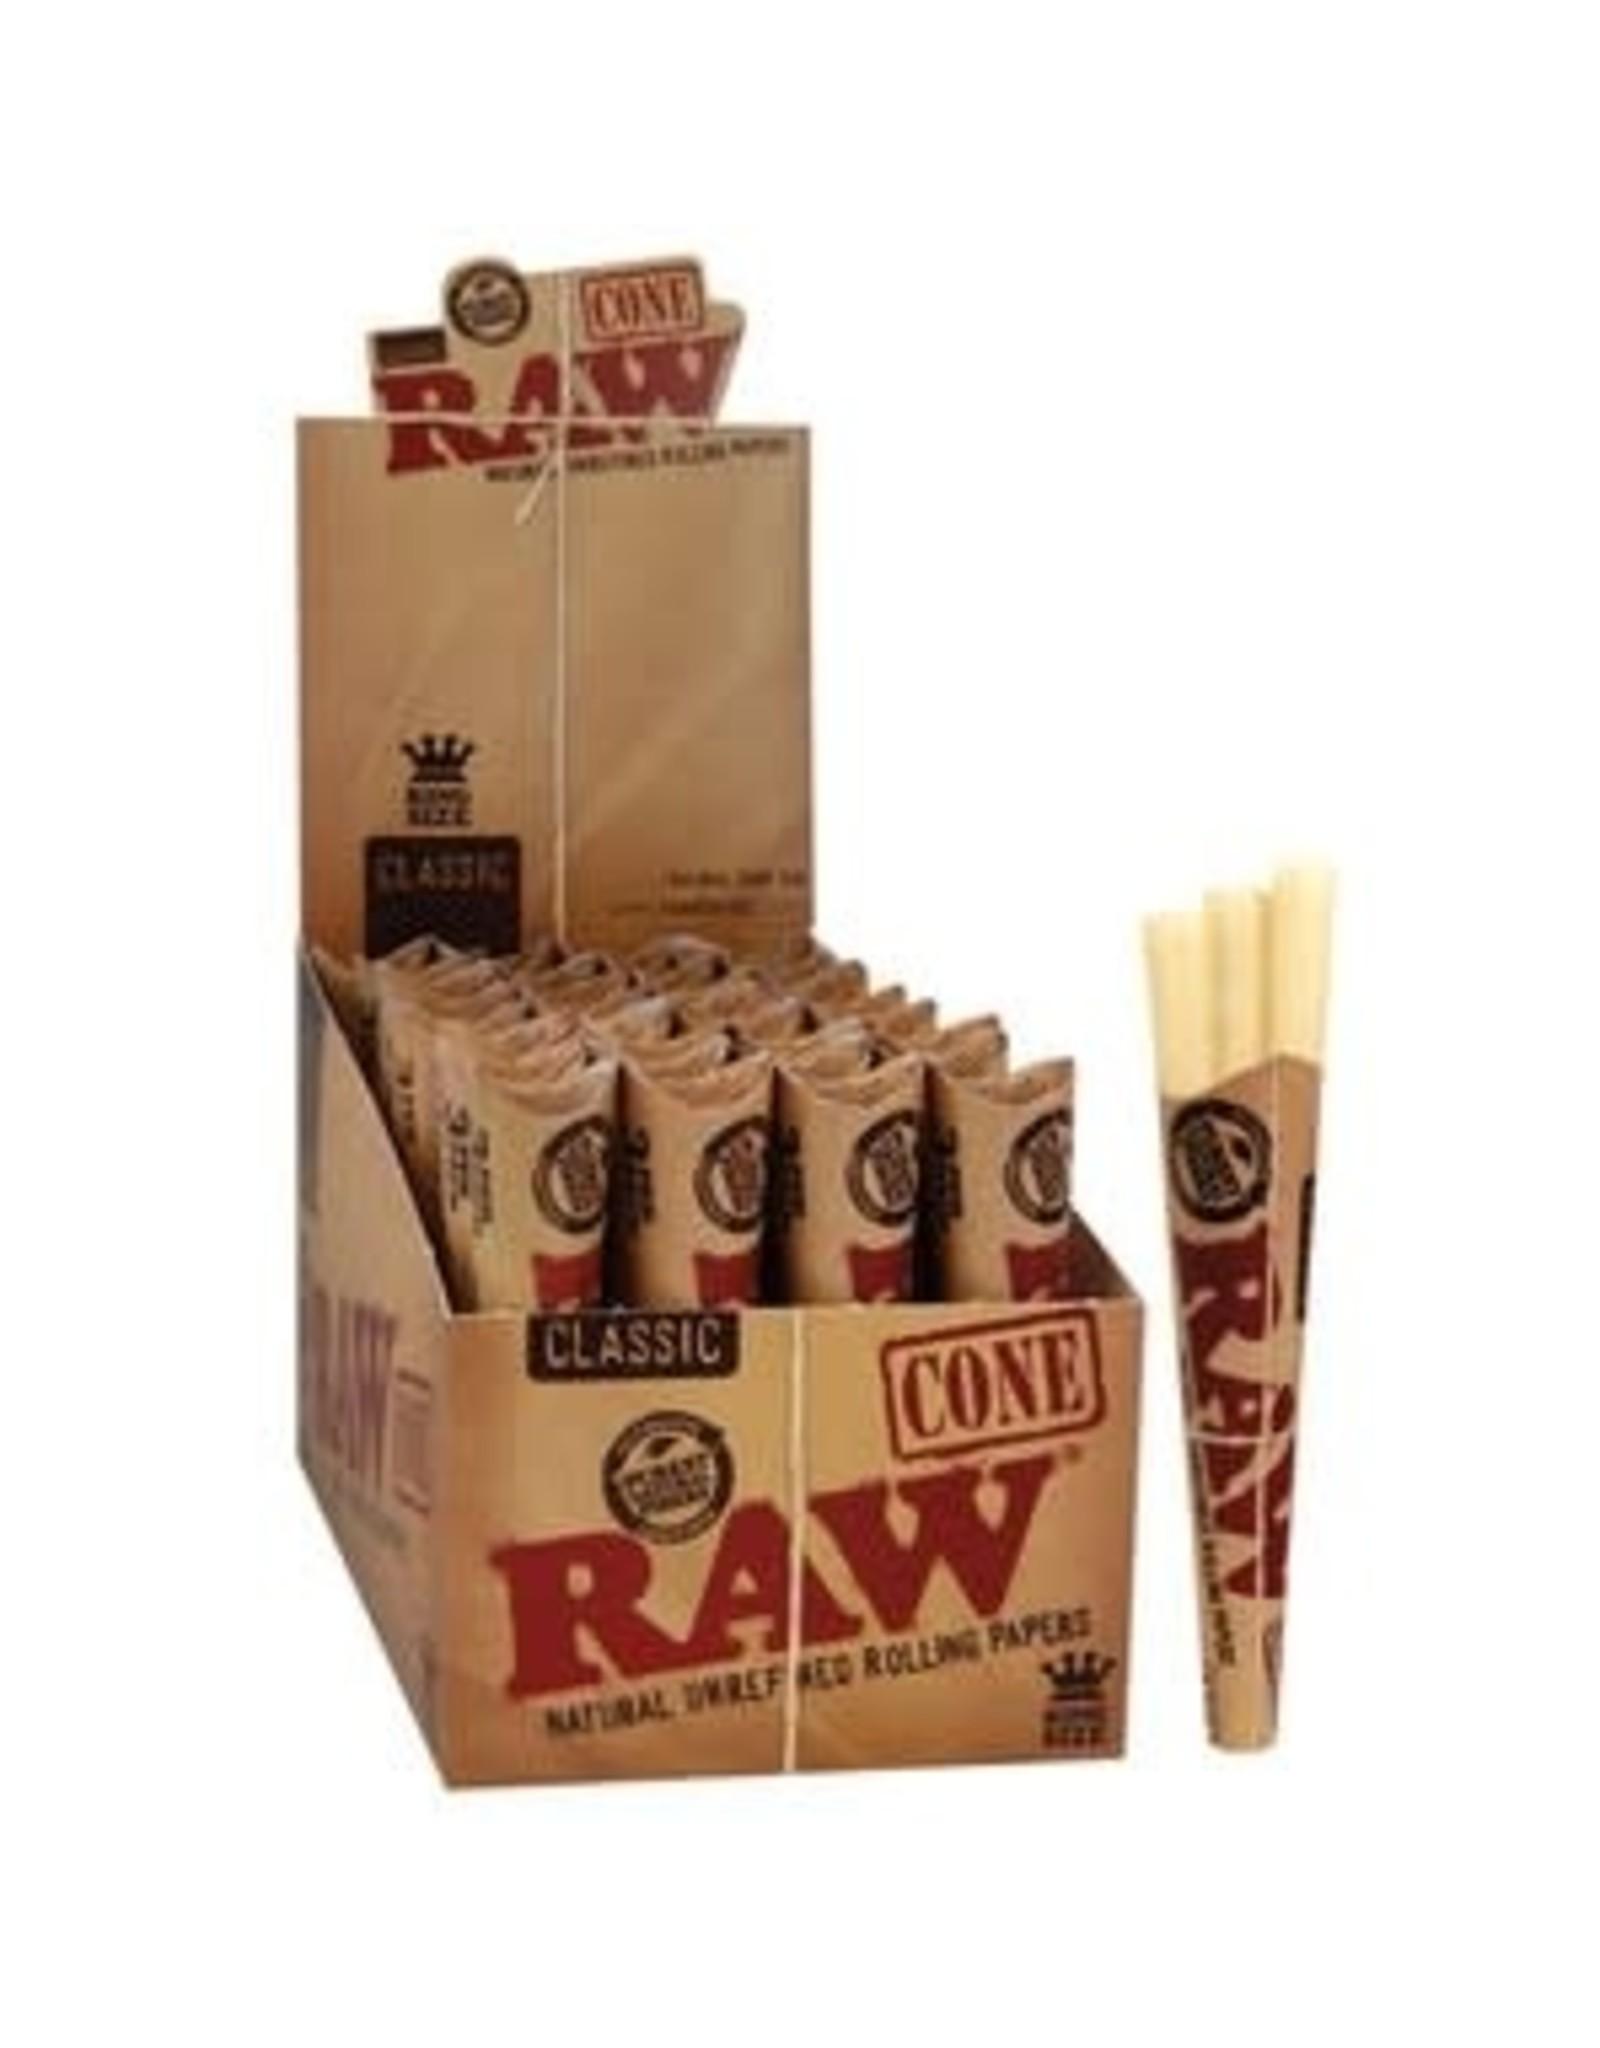 RAW Raw Cone's